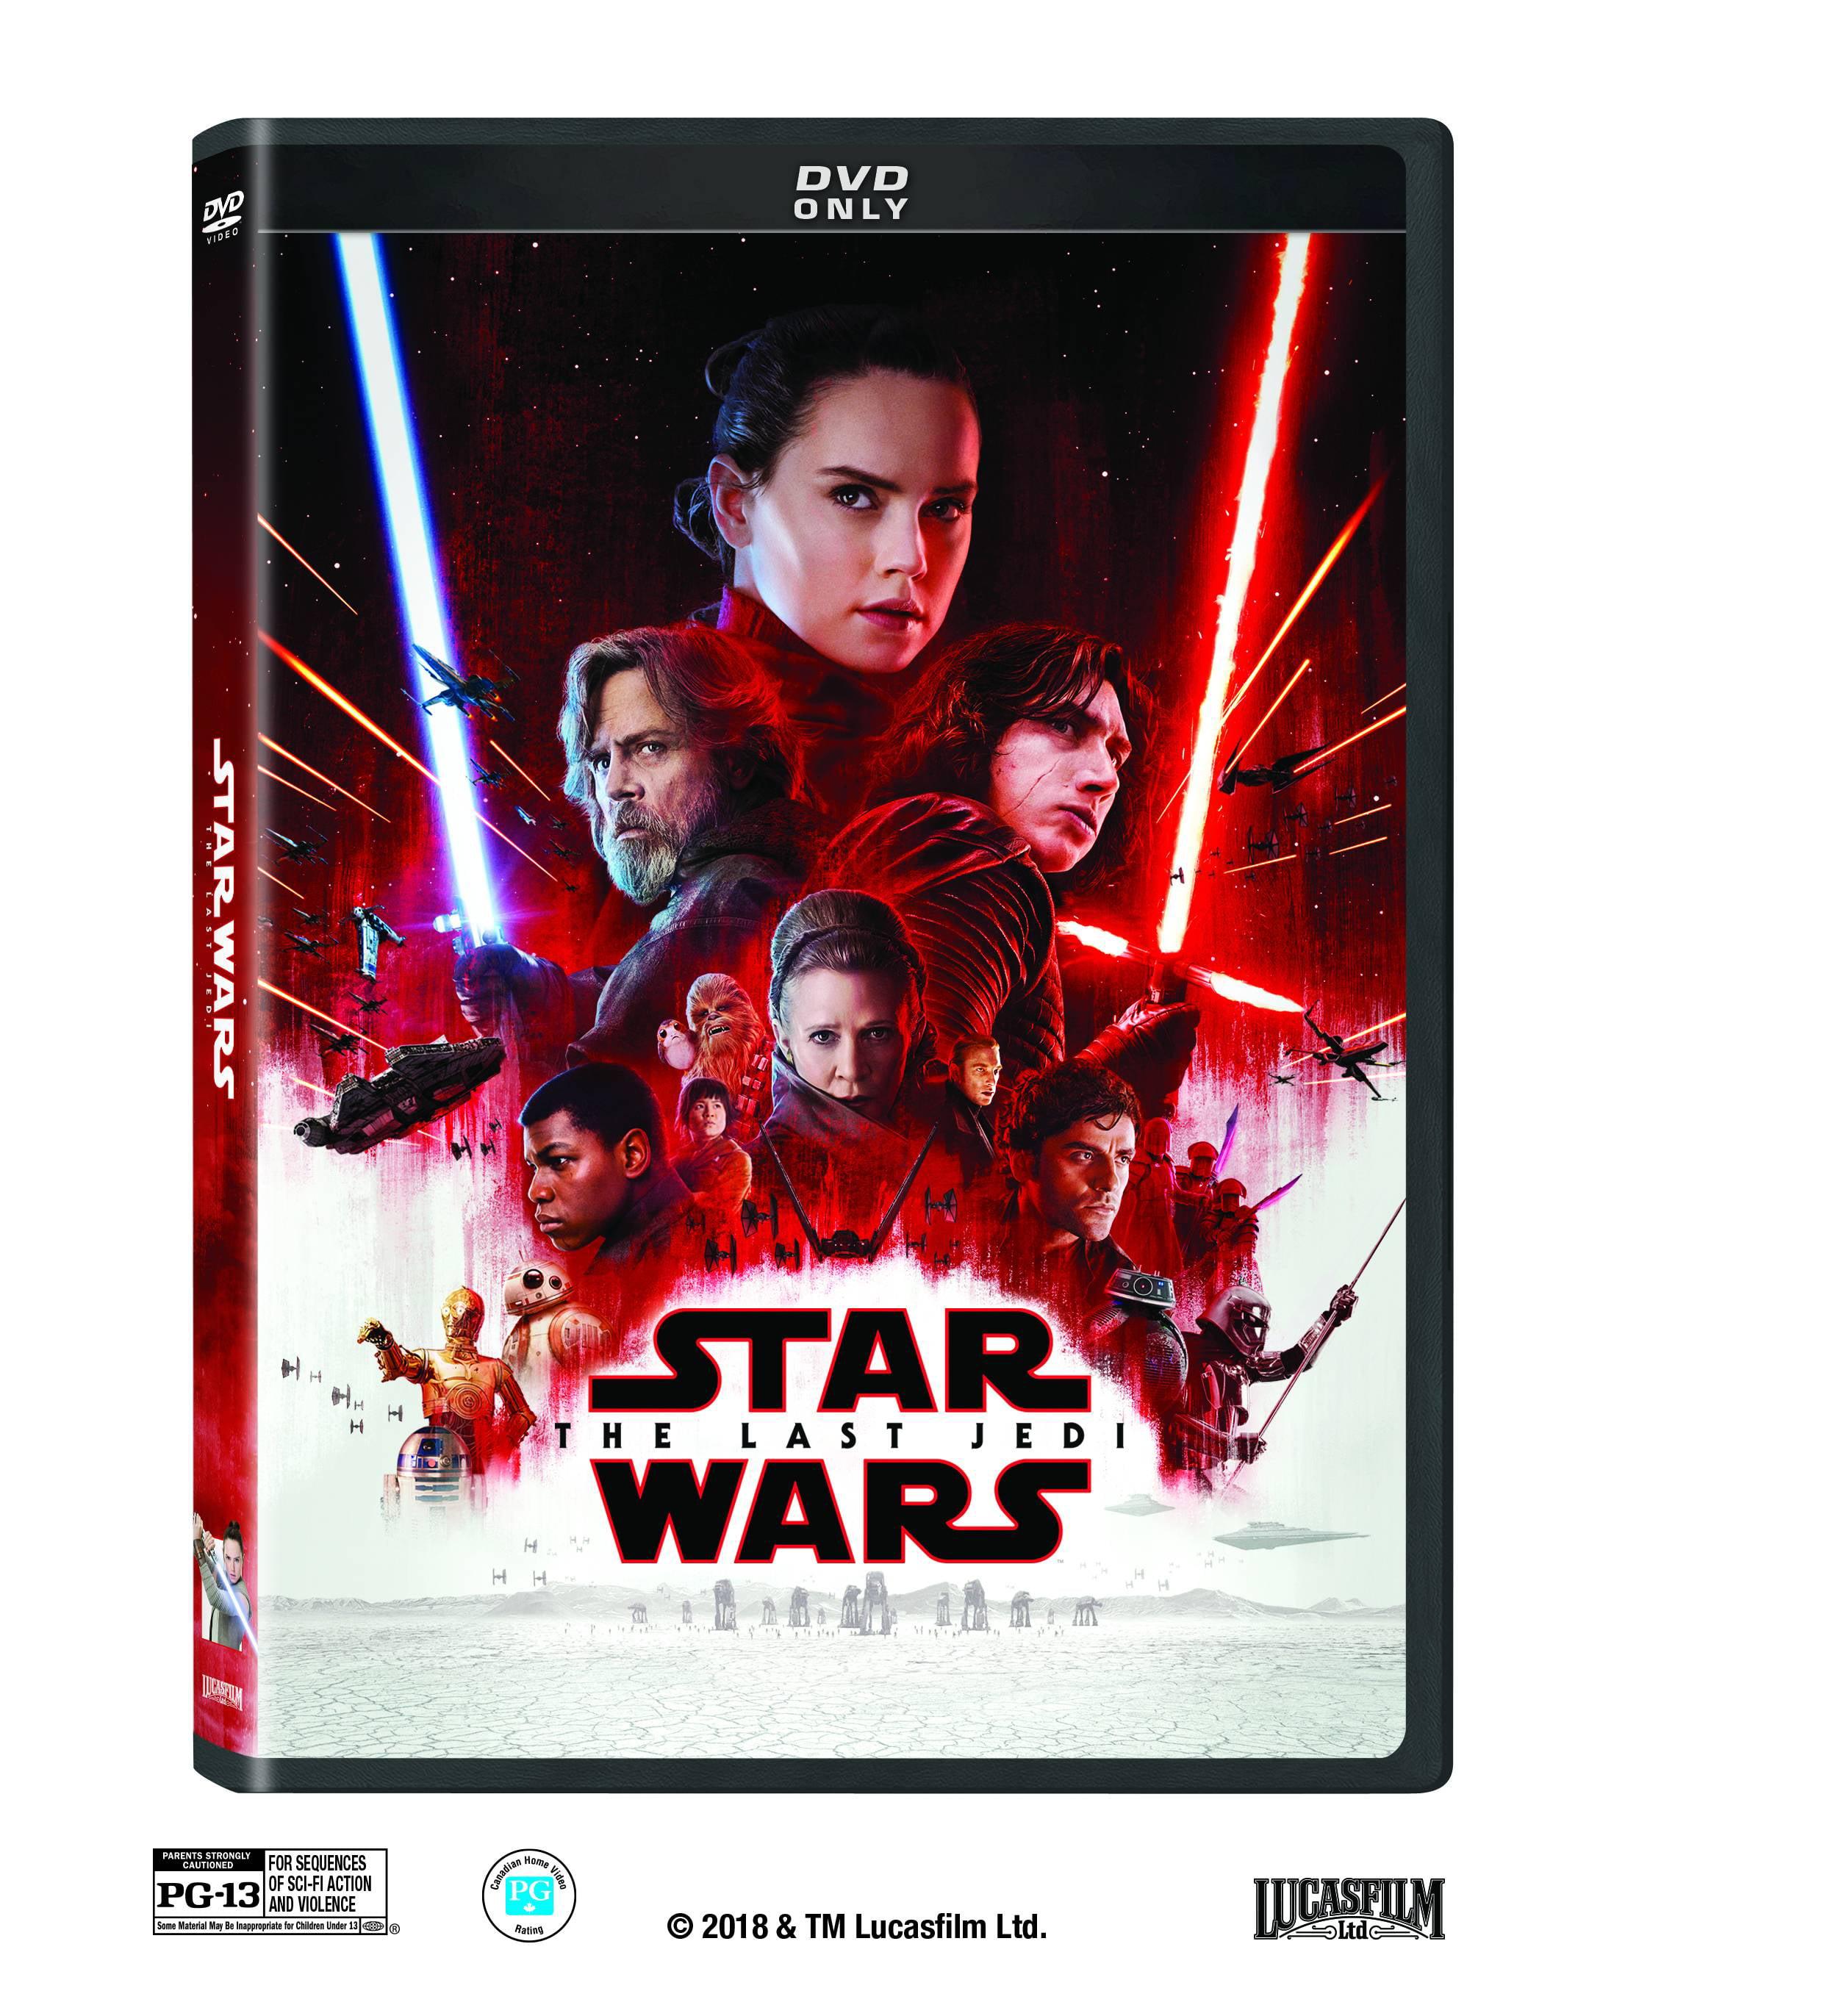 Star Wars: Episode VIII: The Last Jedi (DVD) by Buena Vista Home Entertaiment